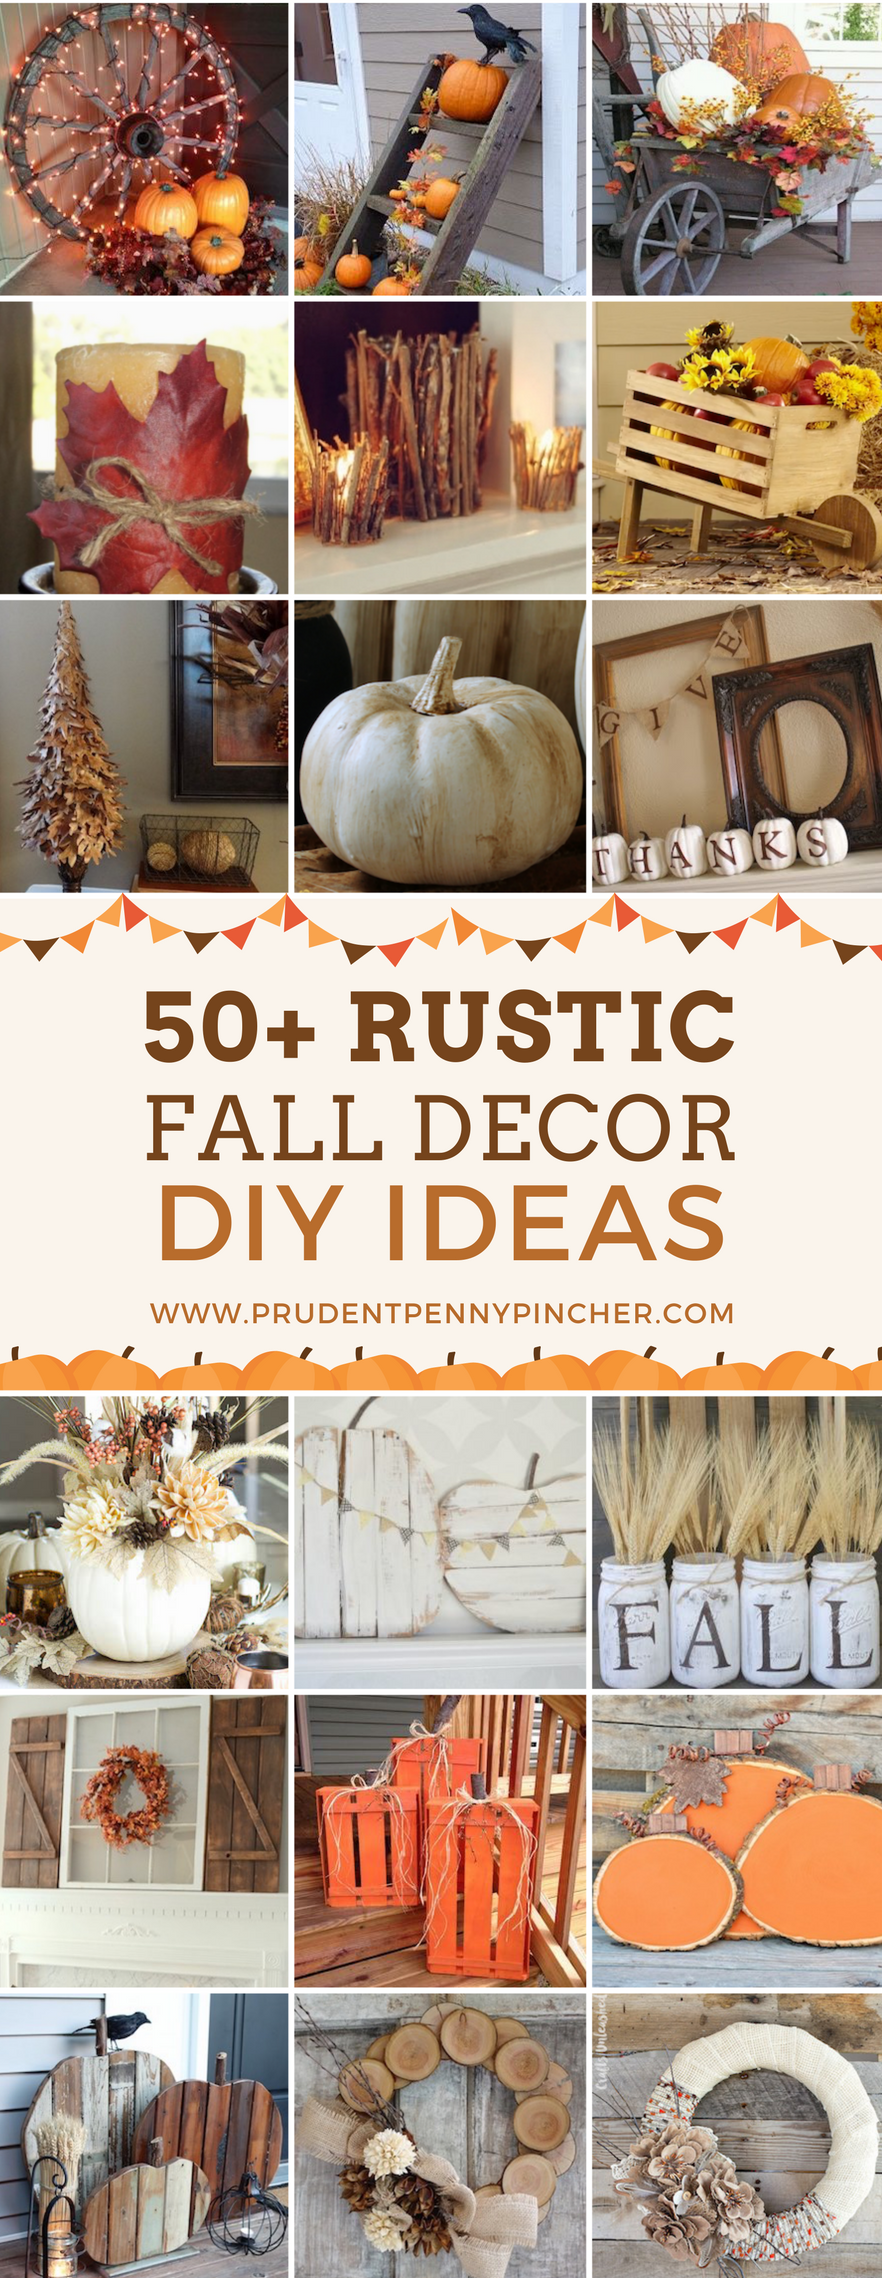 50 Rustic Fall Decor Ideas Rustic Fall Decor Diy Rustic Fall Decor Fall Decor Diy